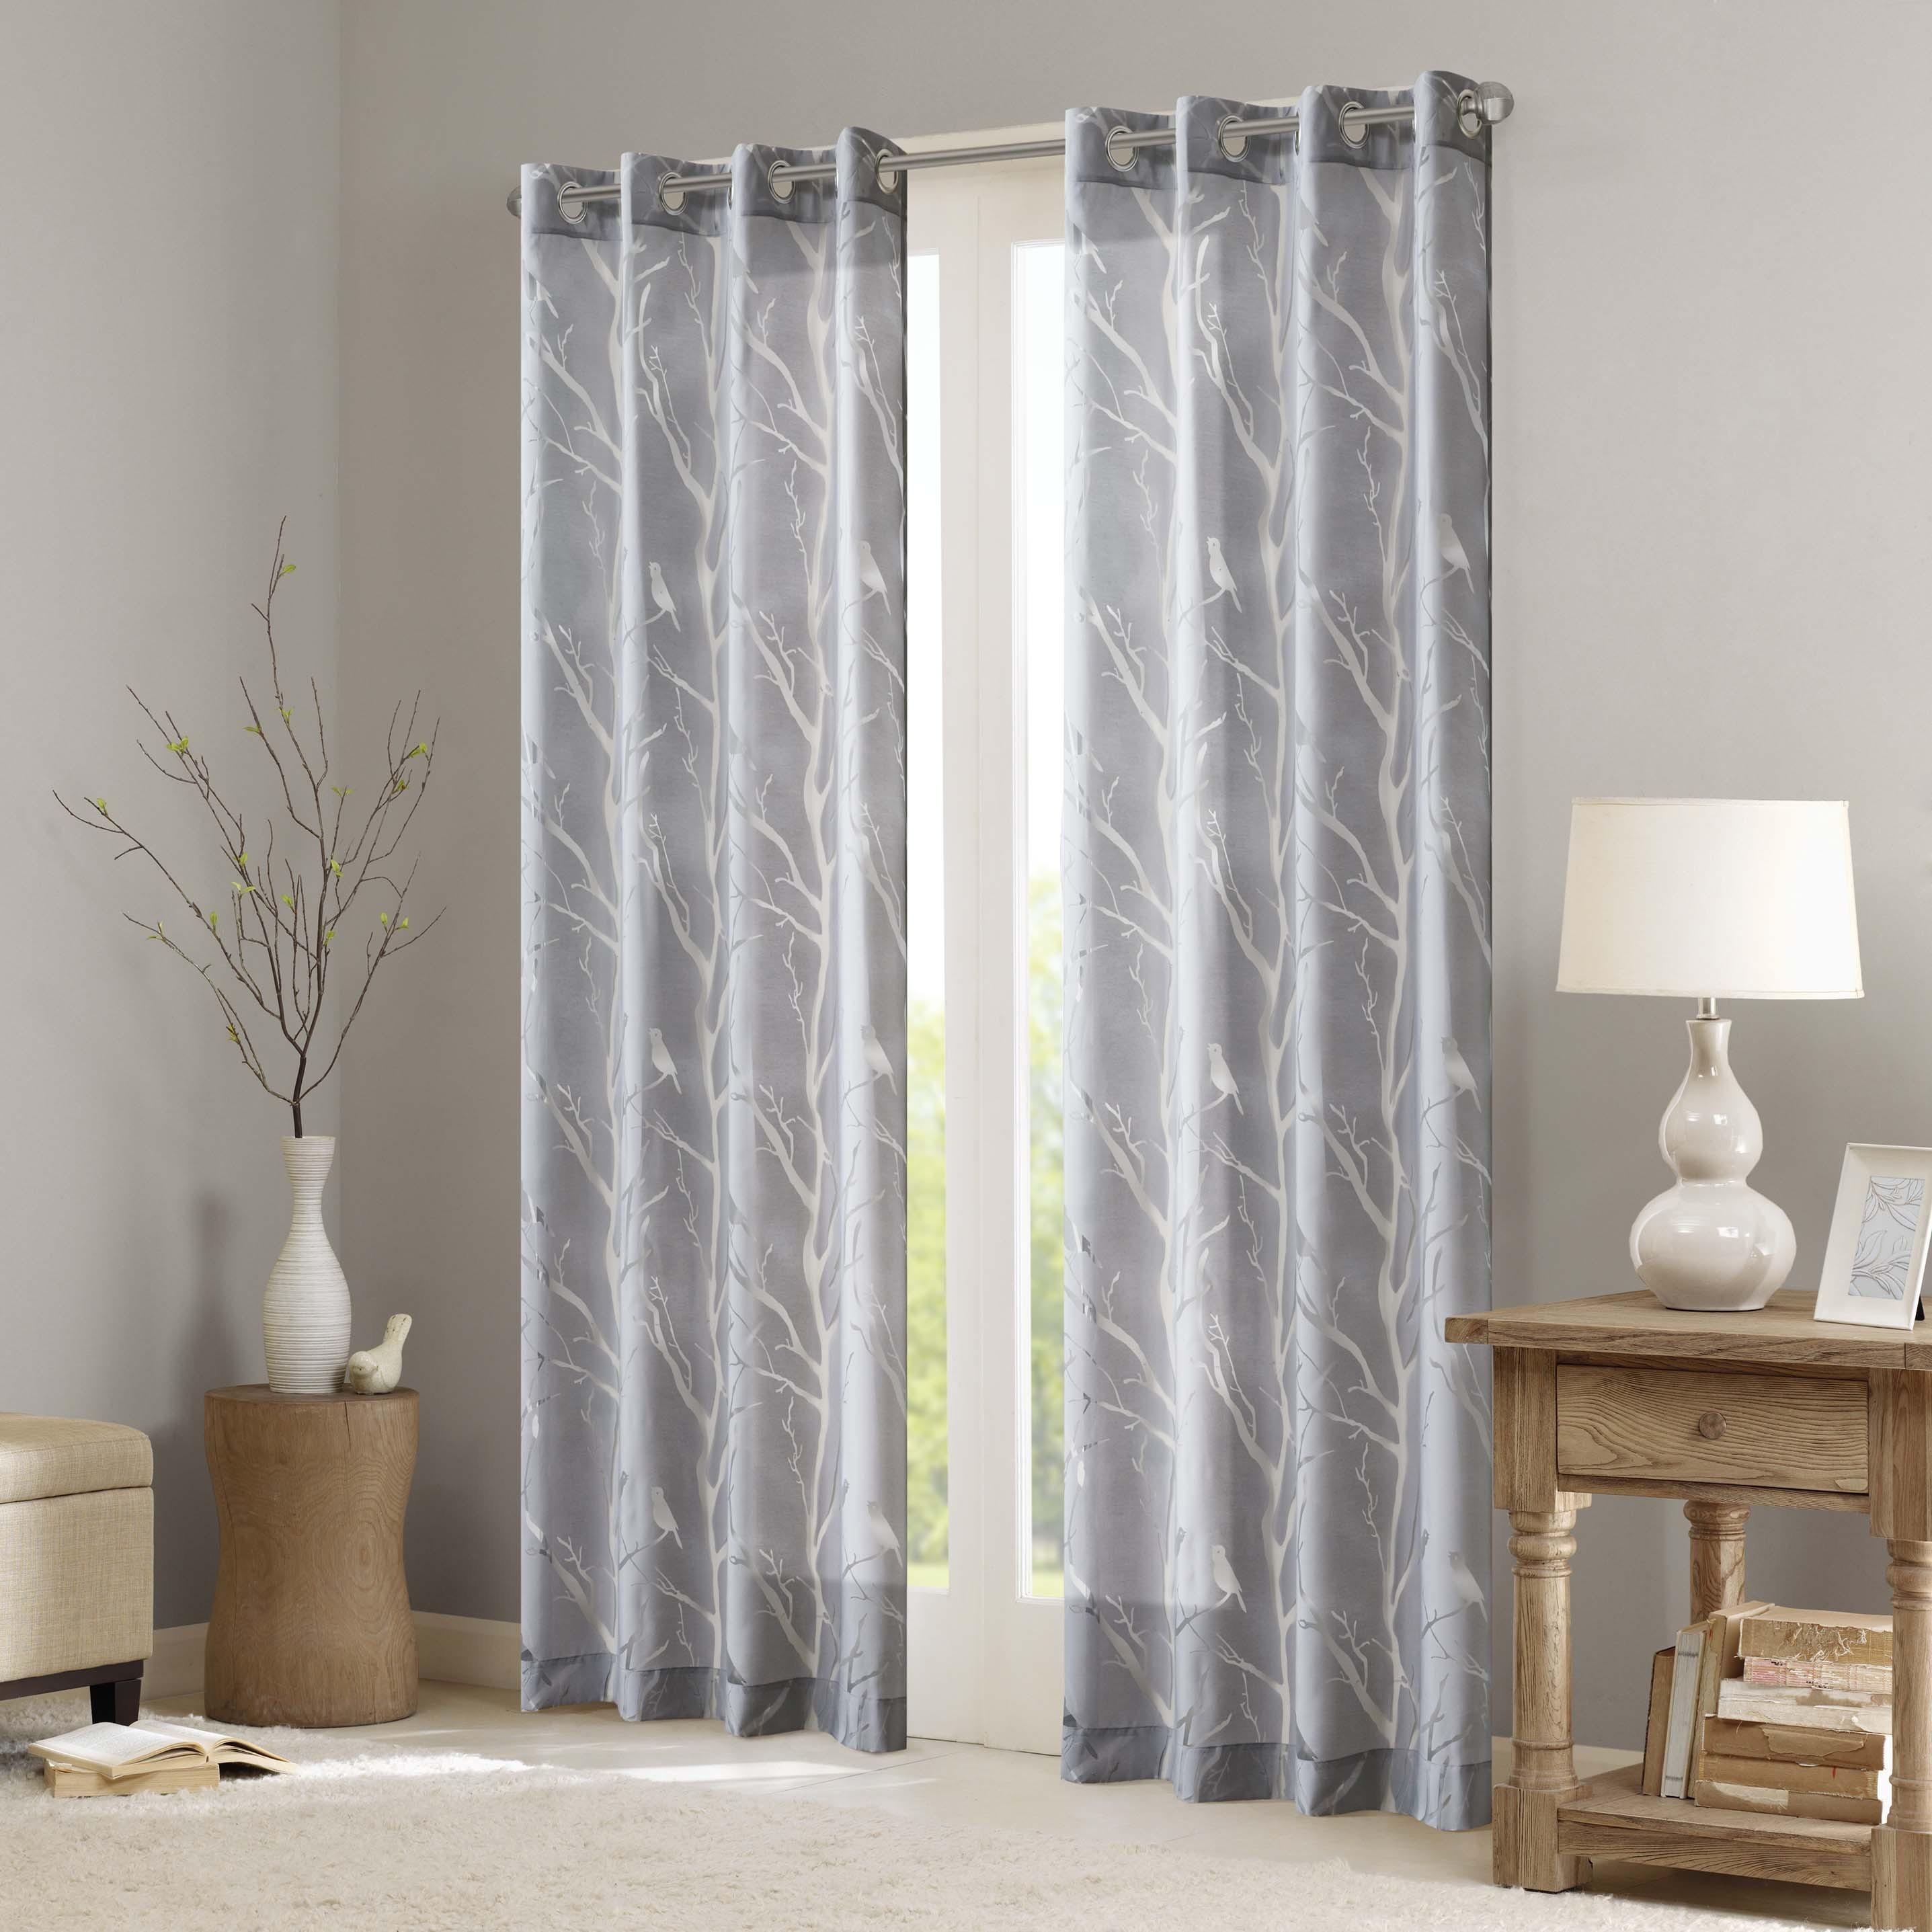 Madison Park Vina Sheer Bird Single Curtain Panel With Regard To Vina Sheer Bird Single Curtain Panels (View 3 of 30)